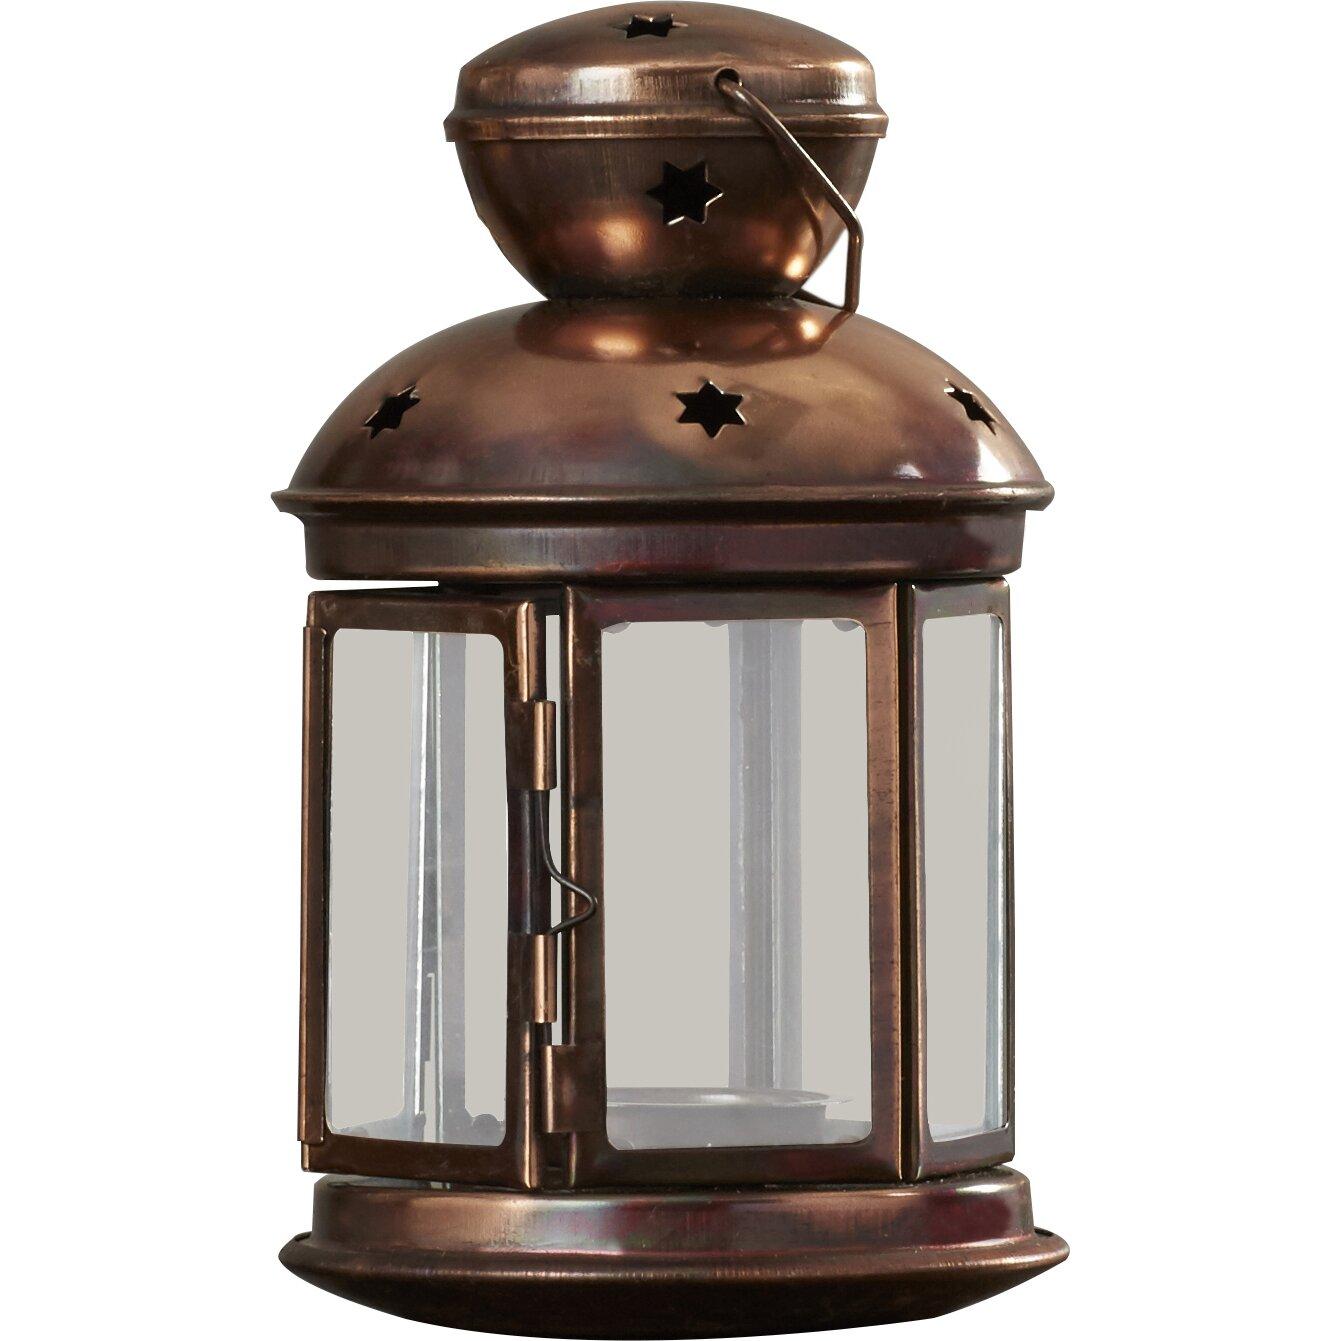 Breakwater bay metal candle lantern reviews wayfair for Wire candle lantern